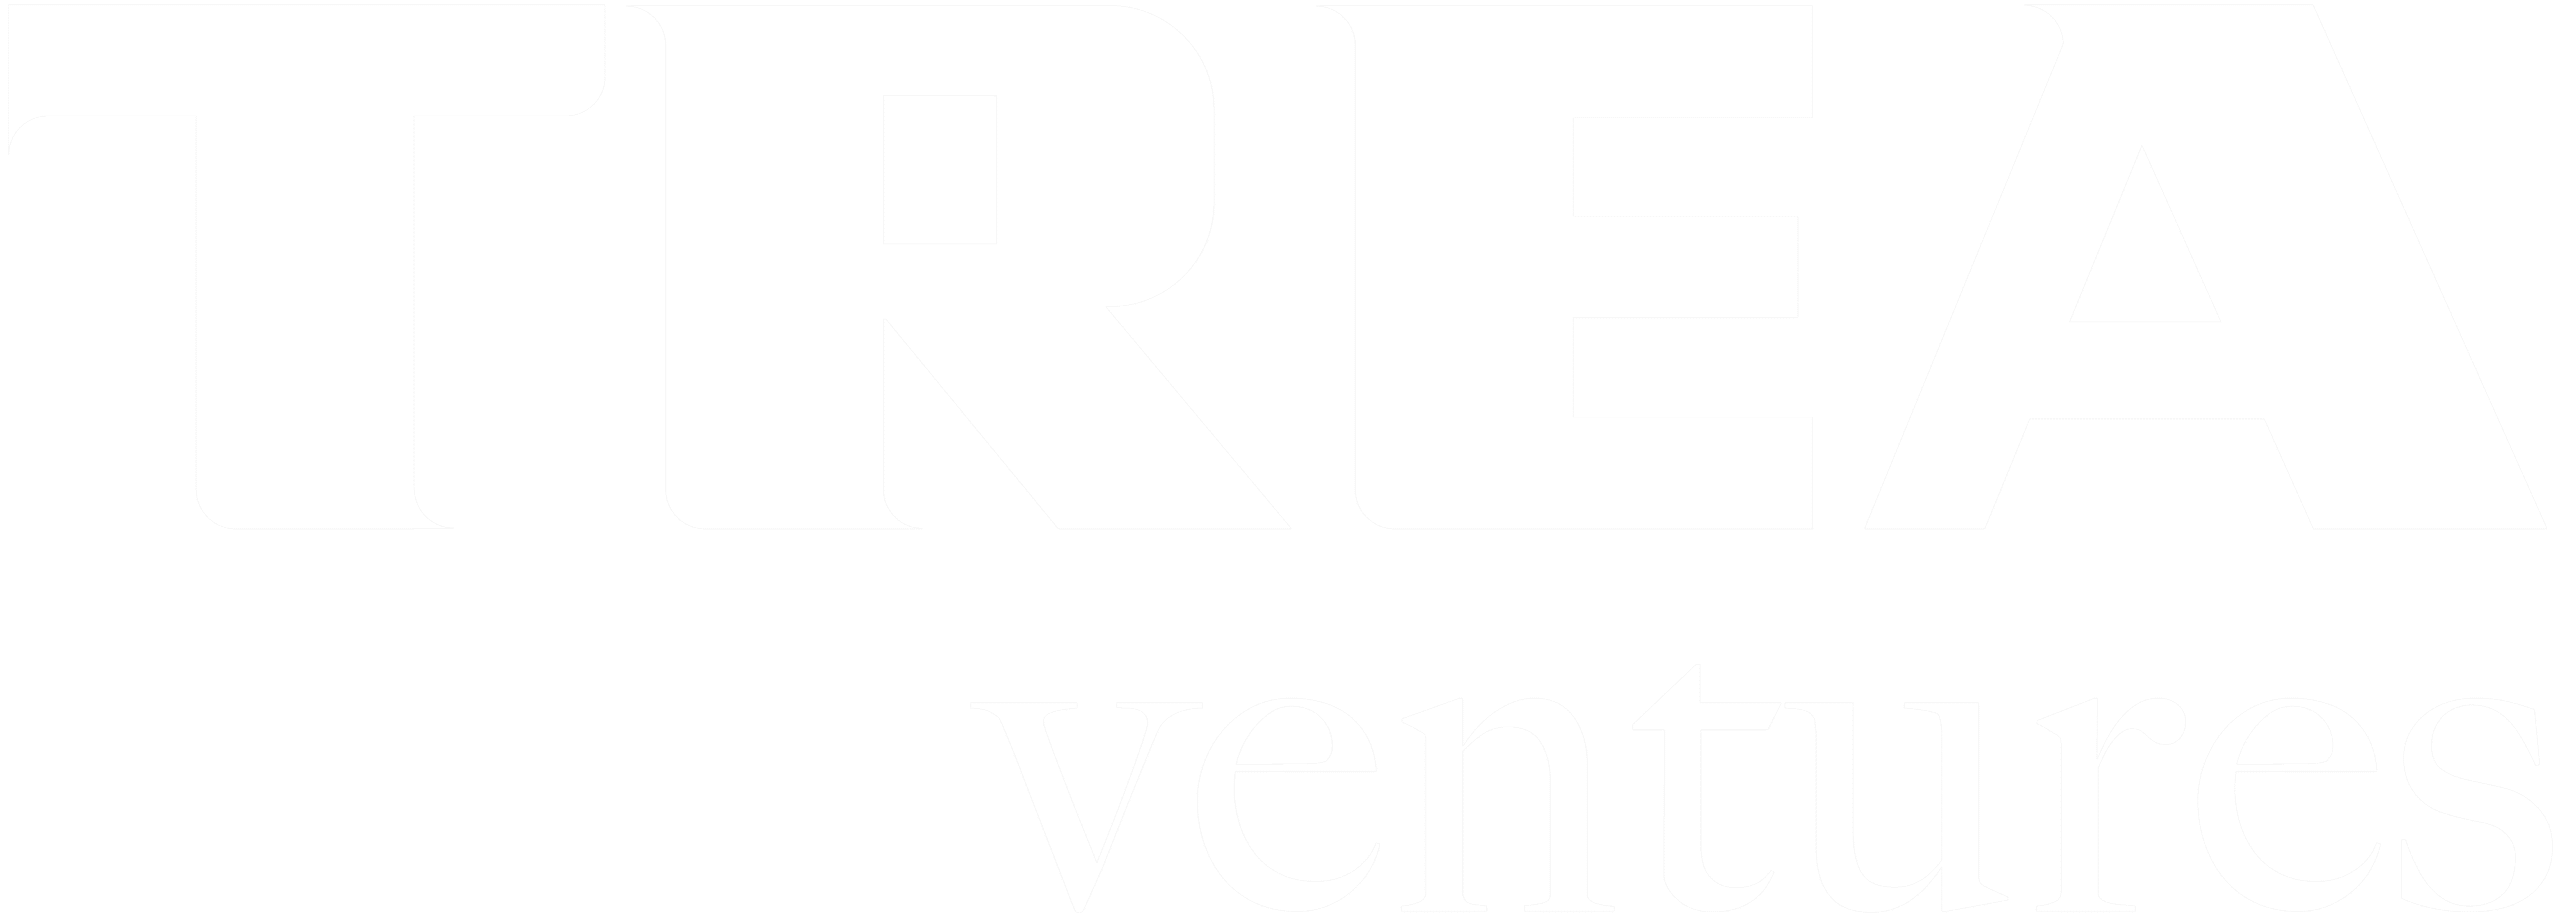 TREA Ventures